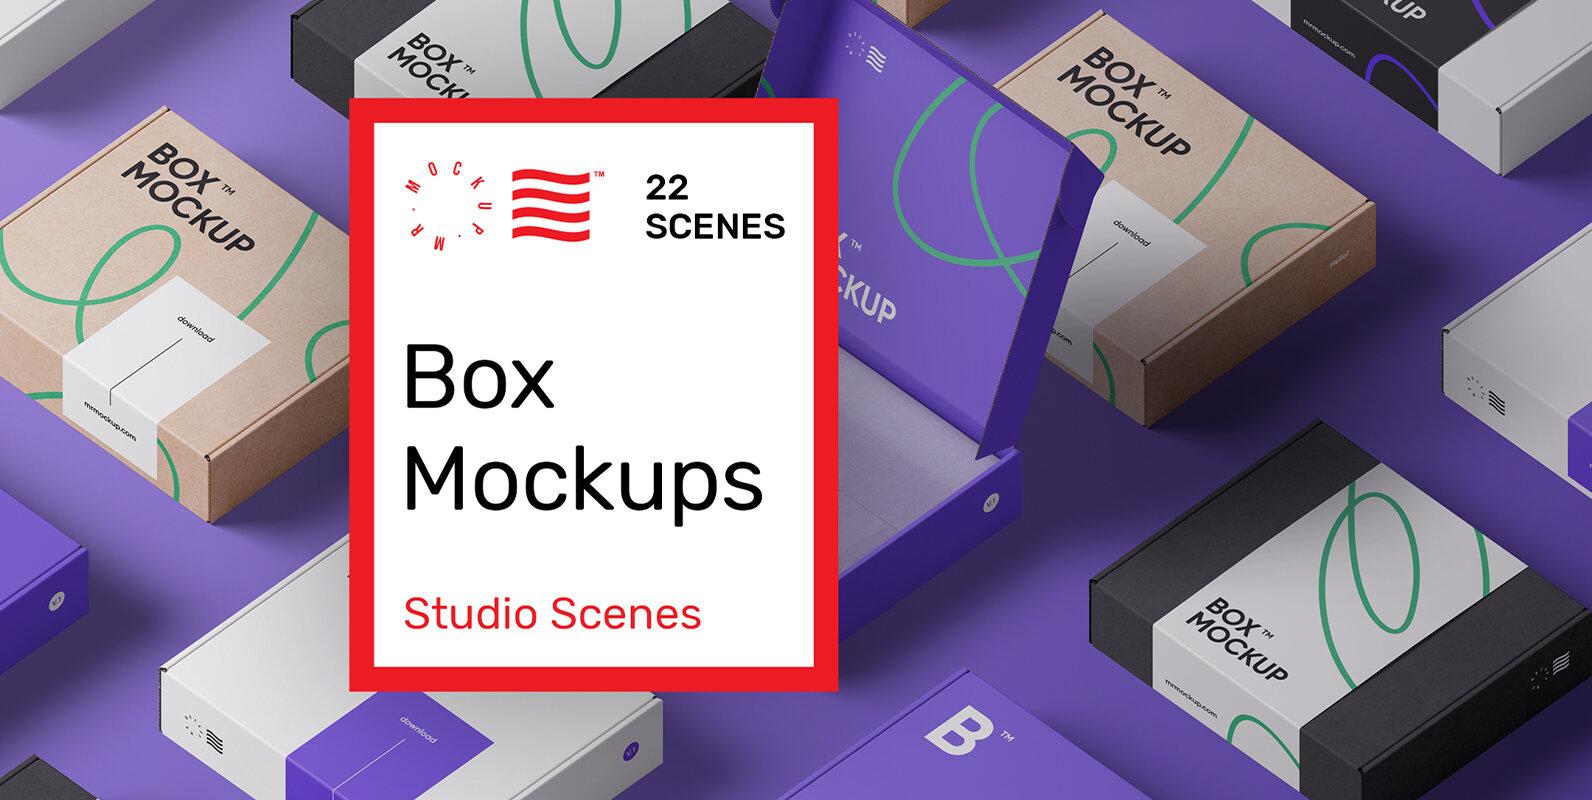 Box Mockups Bundle - Mailing Box